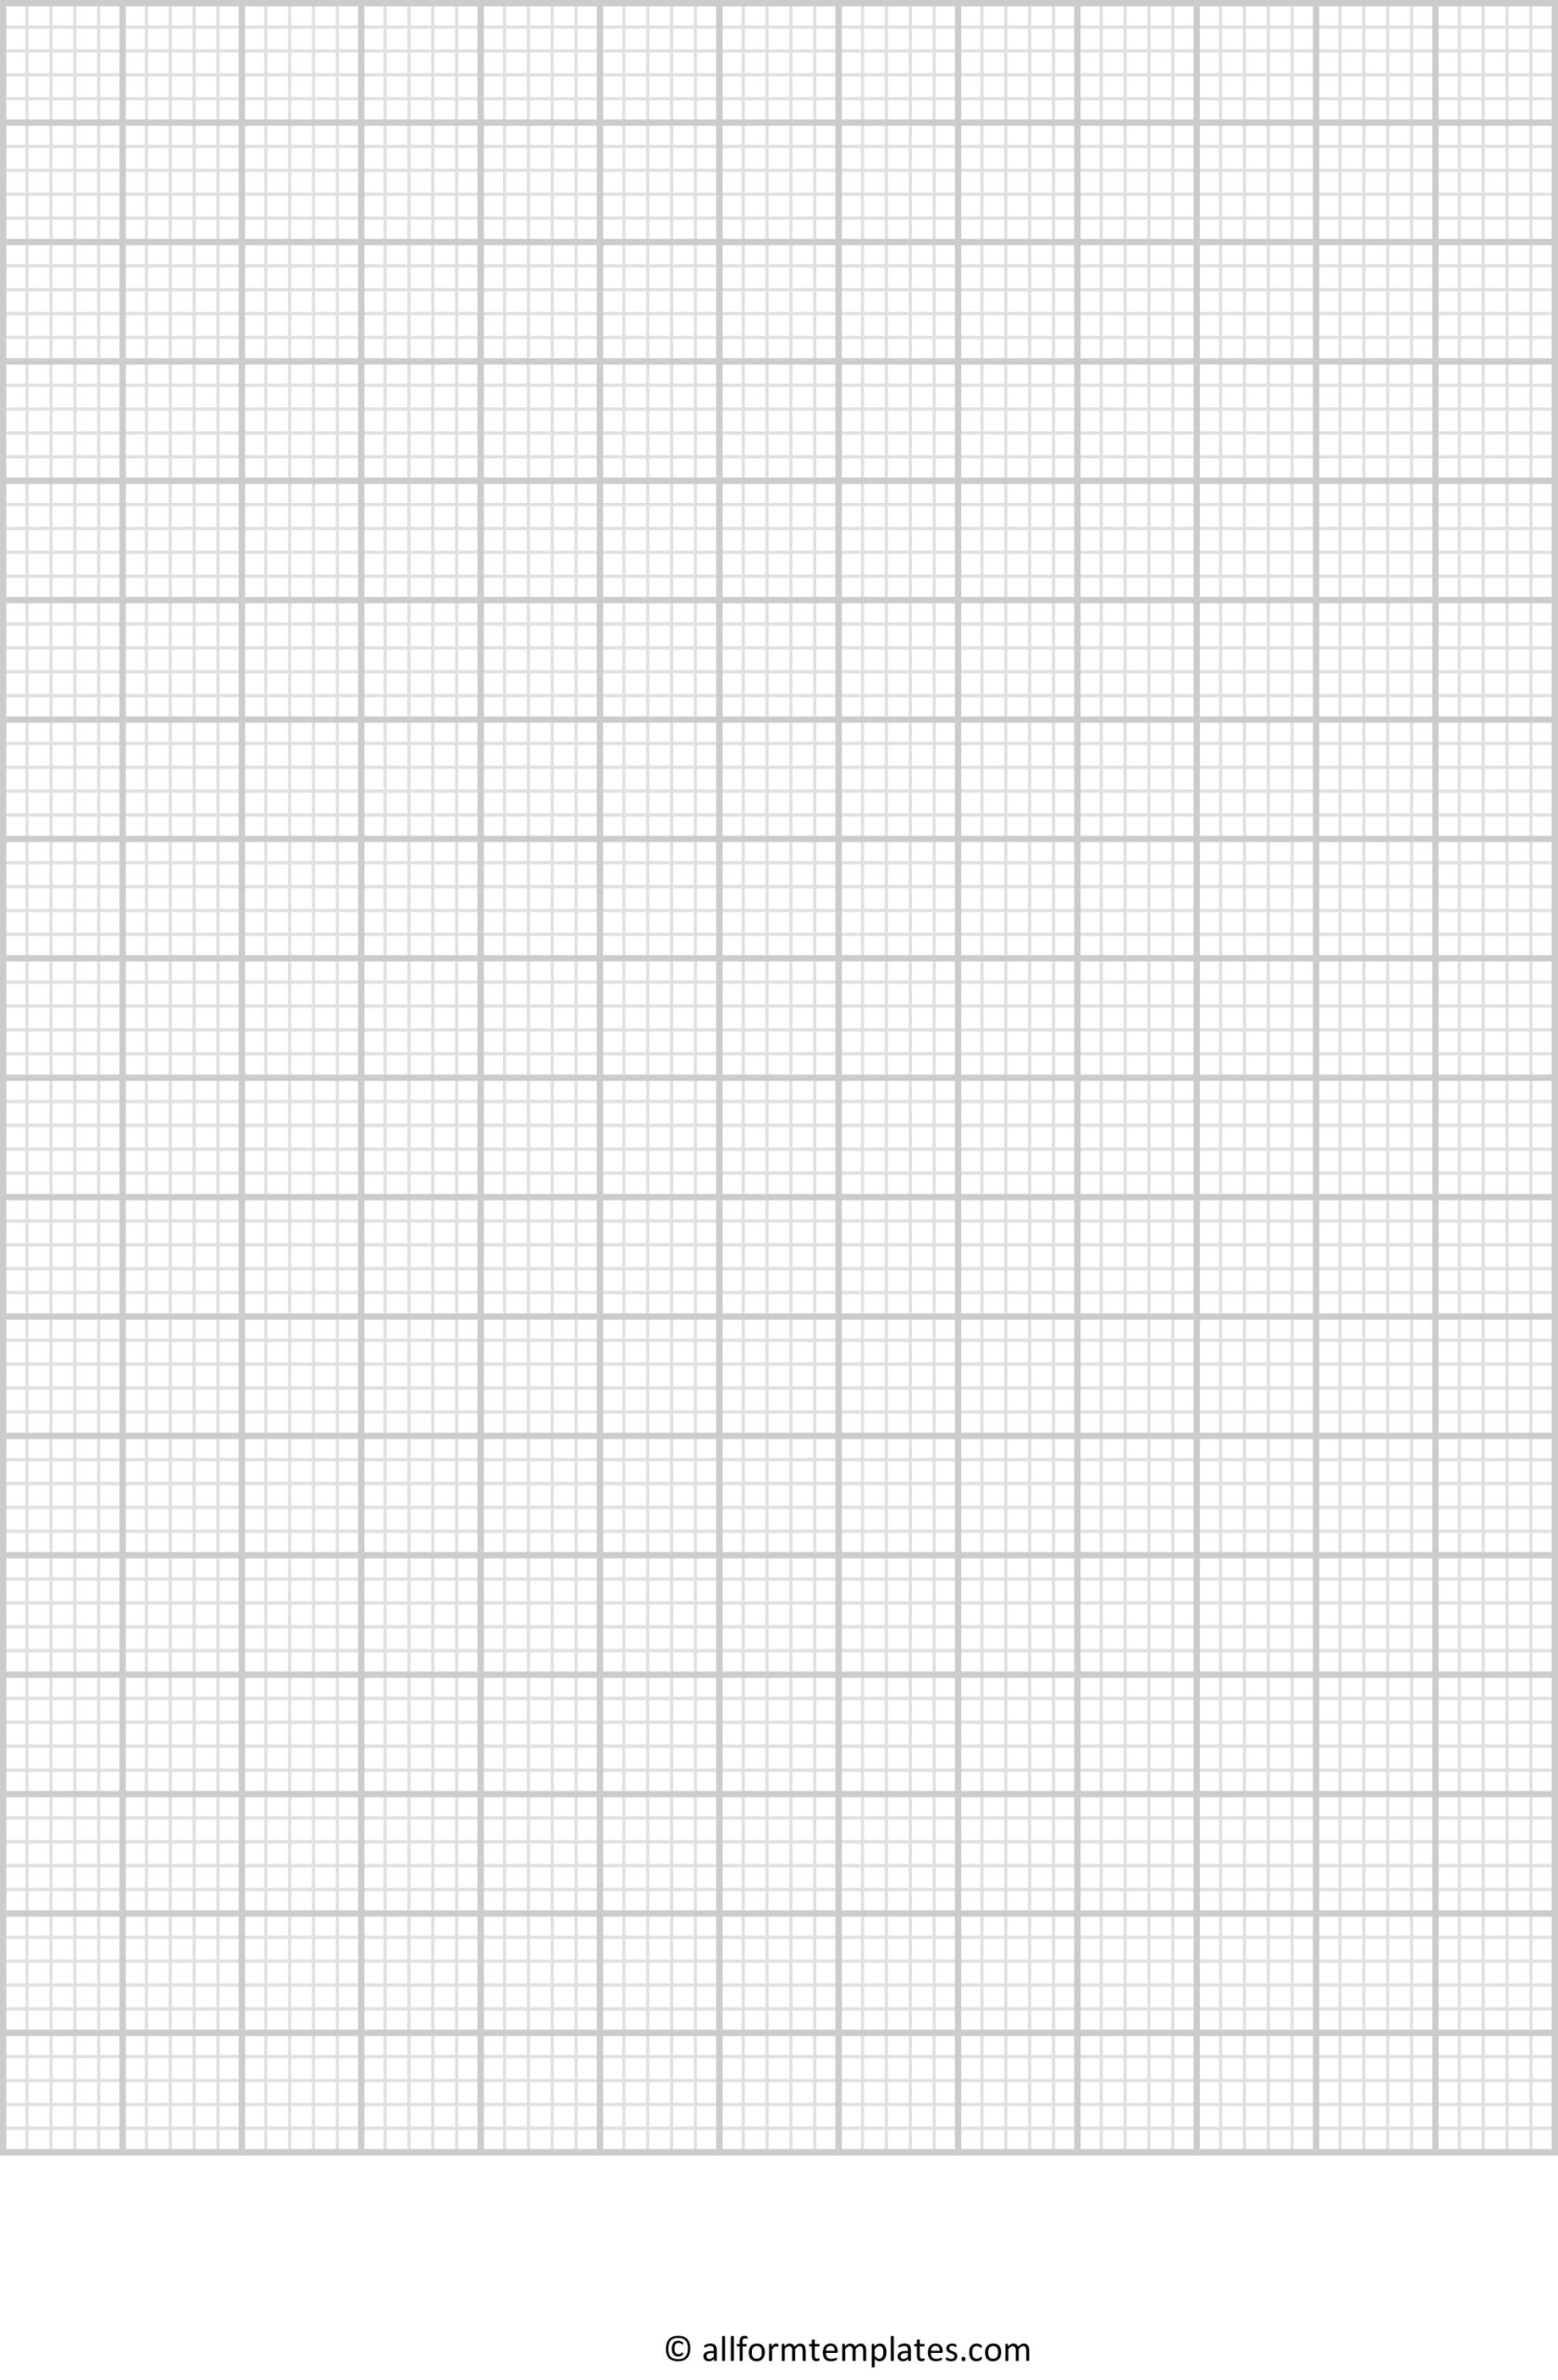 graph-paper-HD